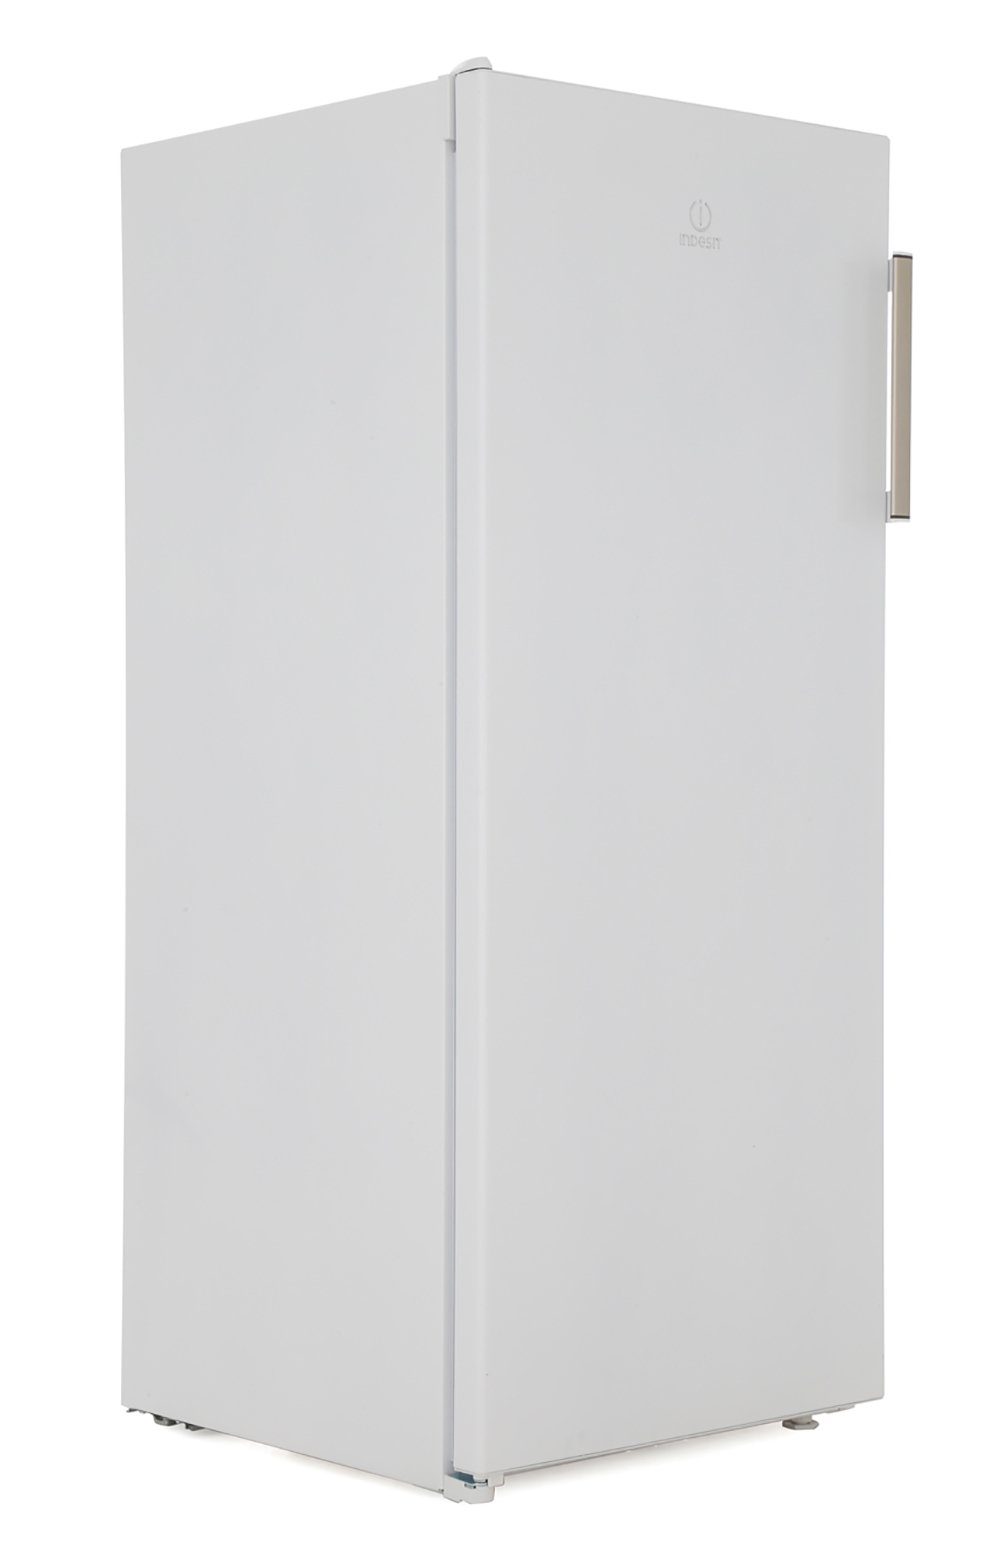 Indesit UI4 1 W UK.1.1 Static Tall Freezer